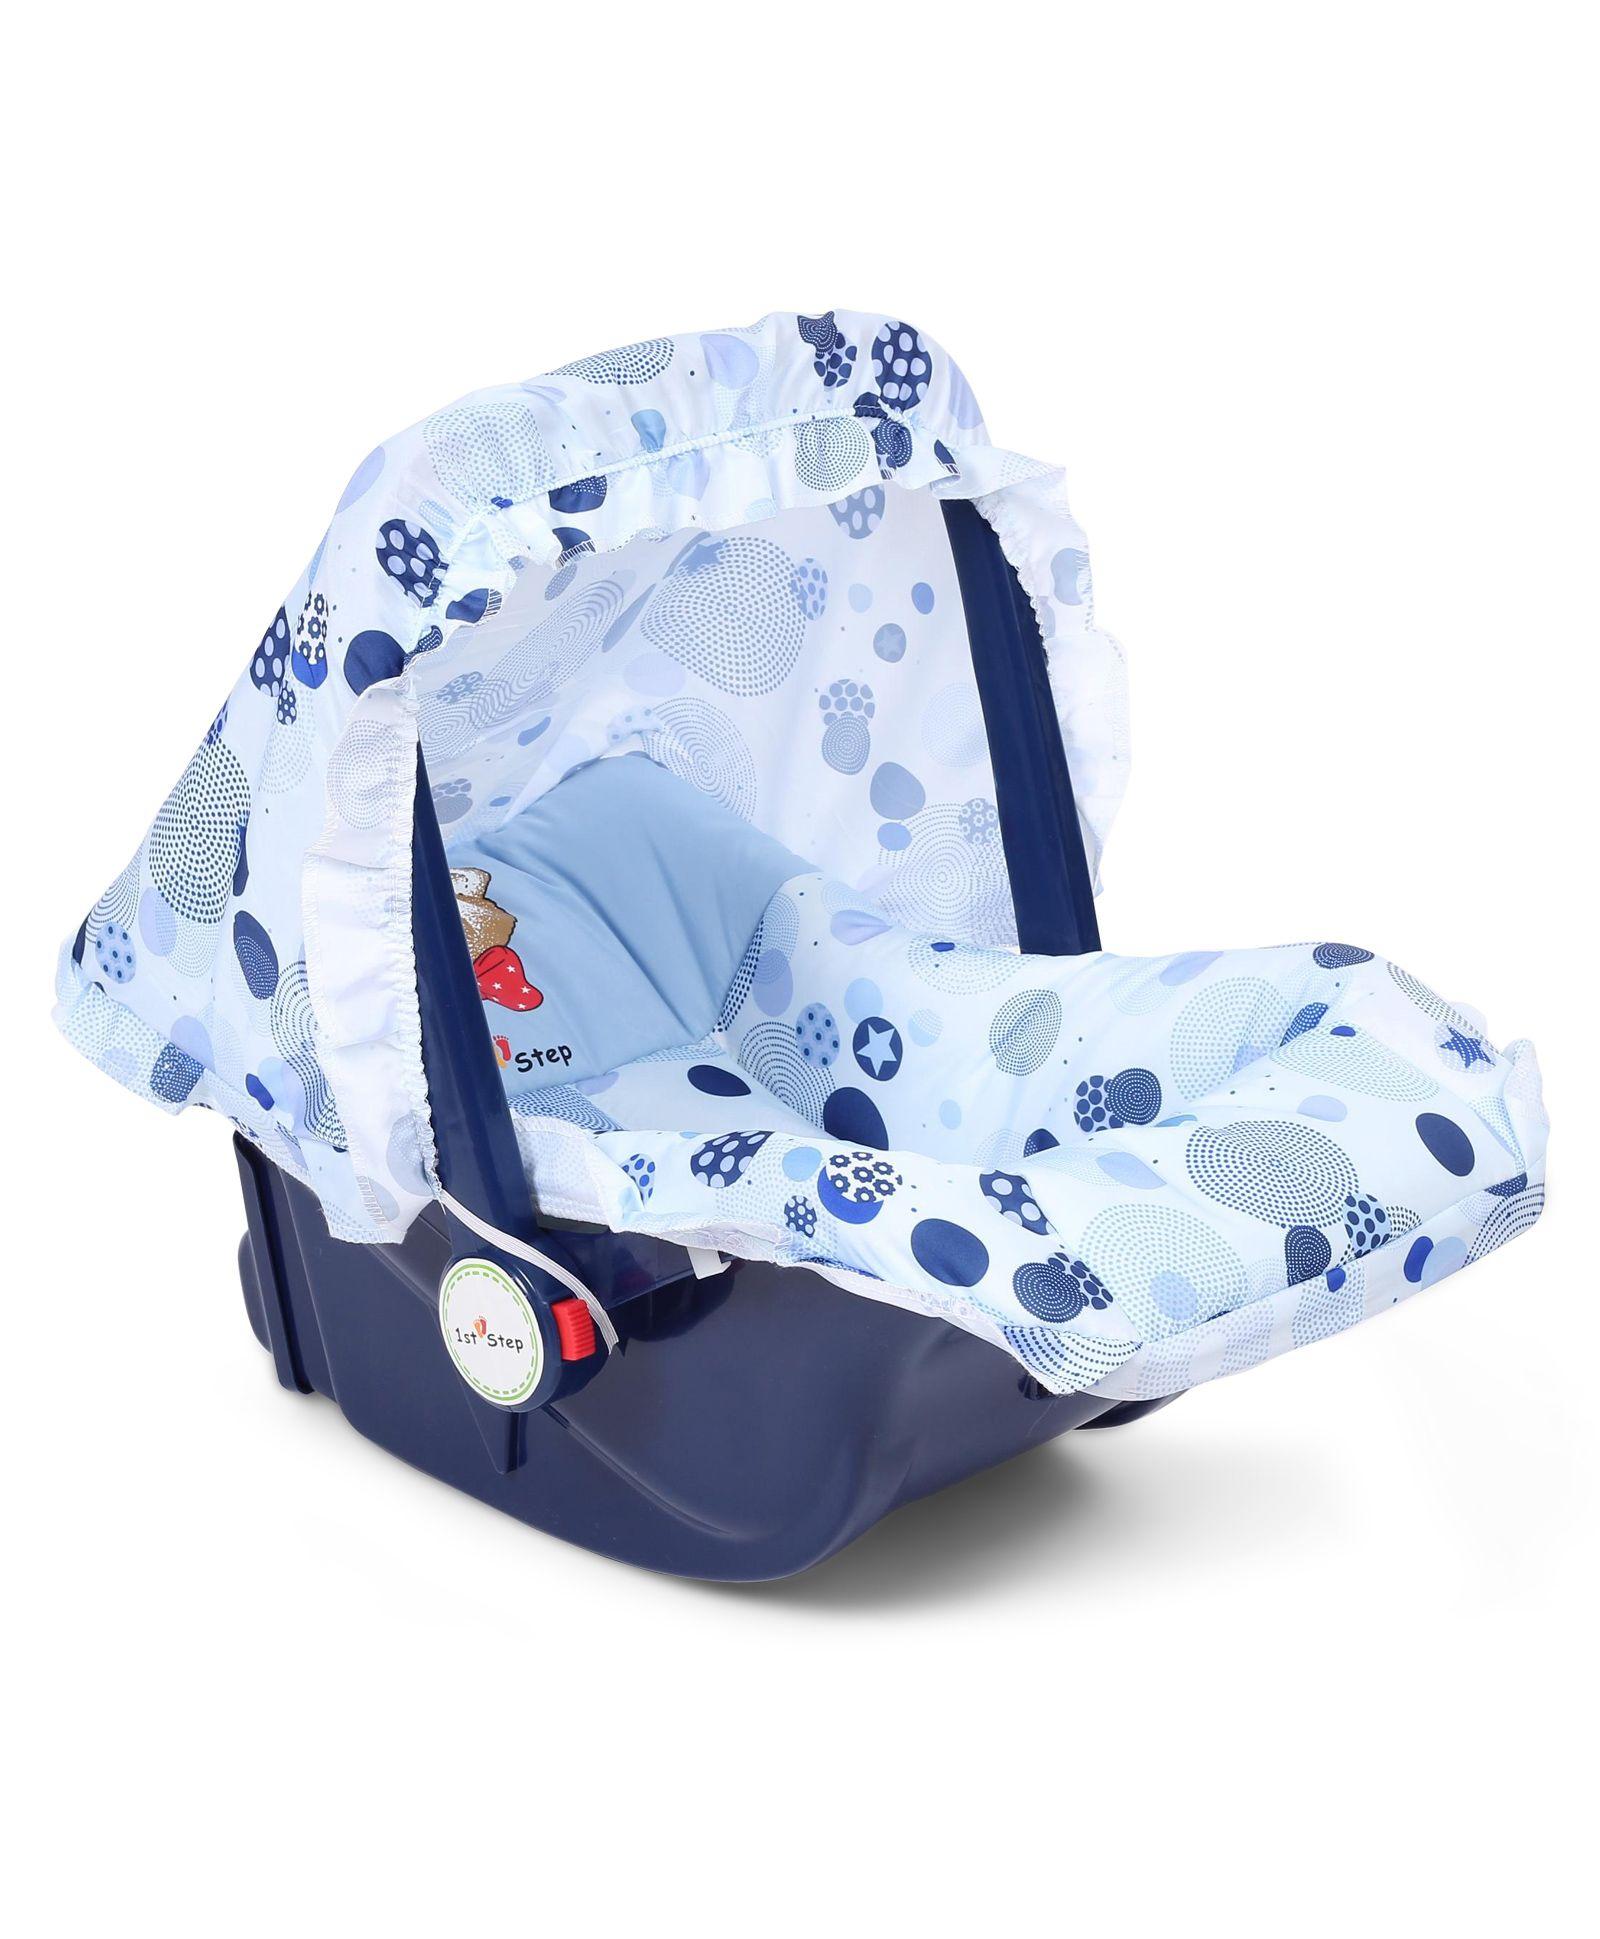 1st Step Baby Carry Cot Cum Rocker Star Print - Blue